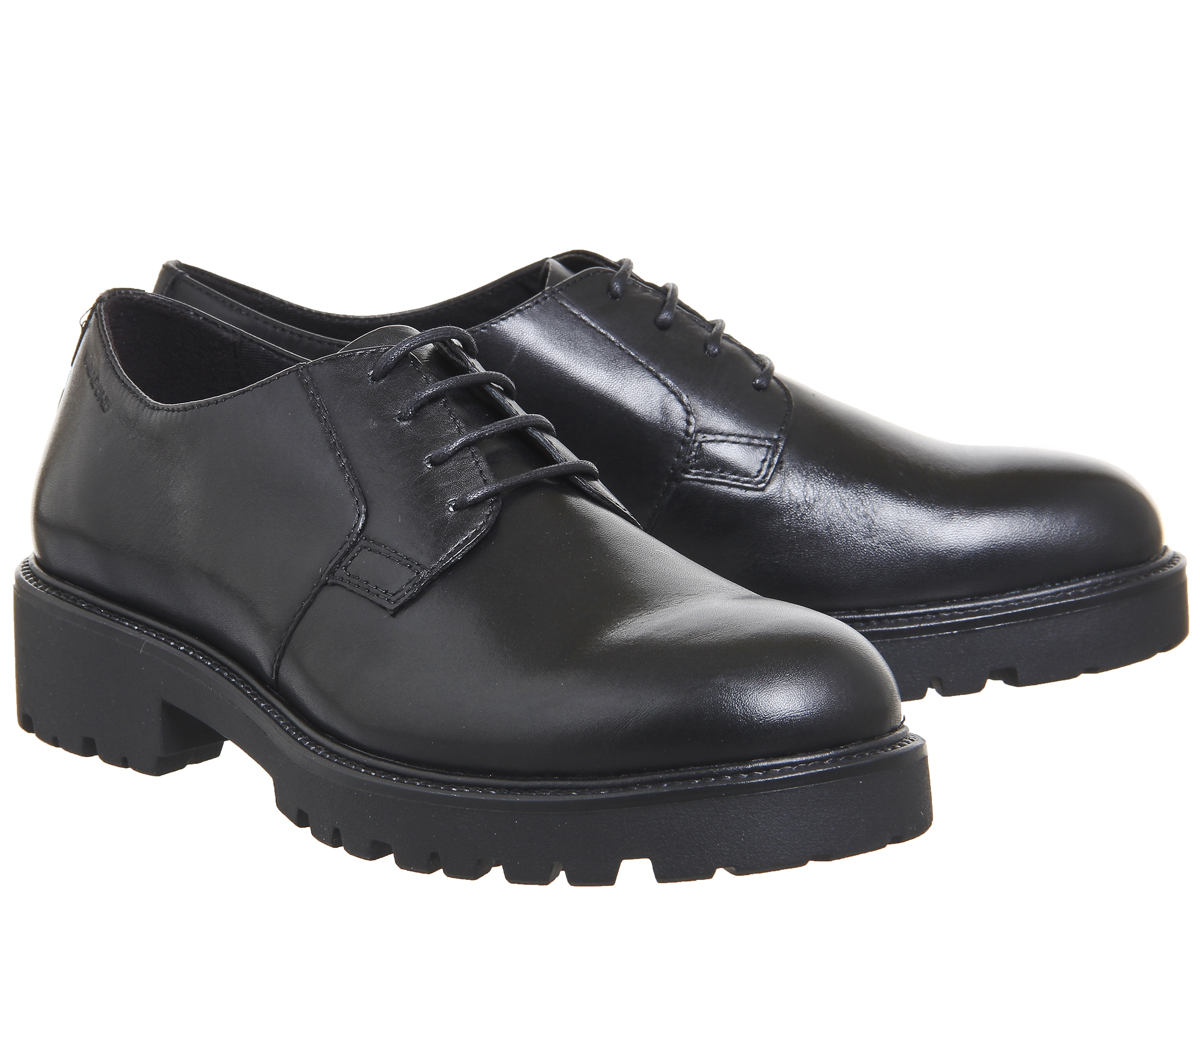 Womens Womens Womens Vagabond Kenova Lace shoes Black Leather Flats 38b4fe